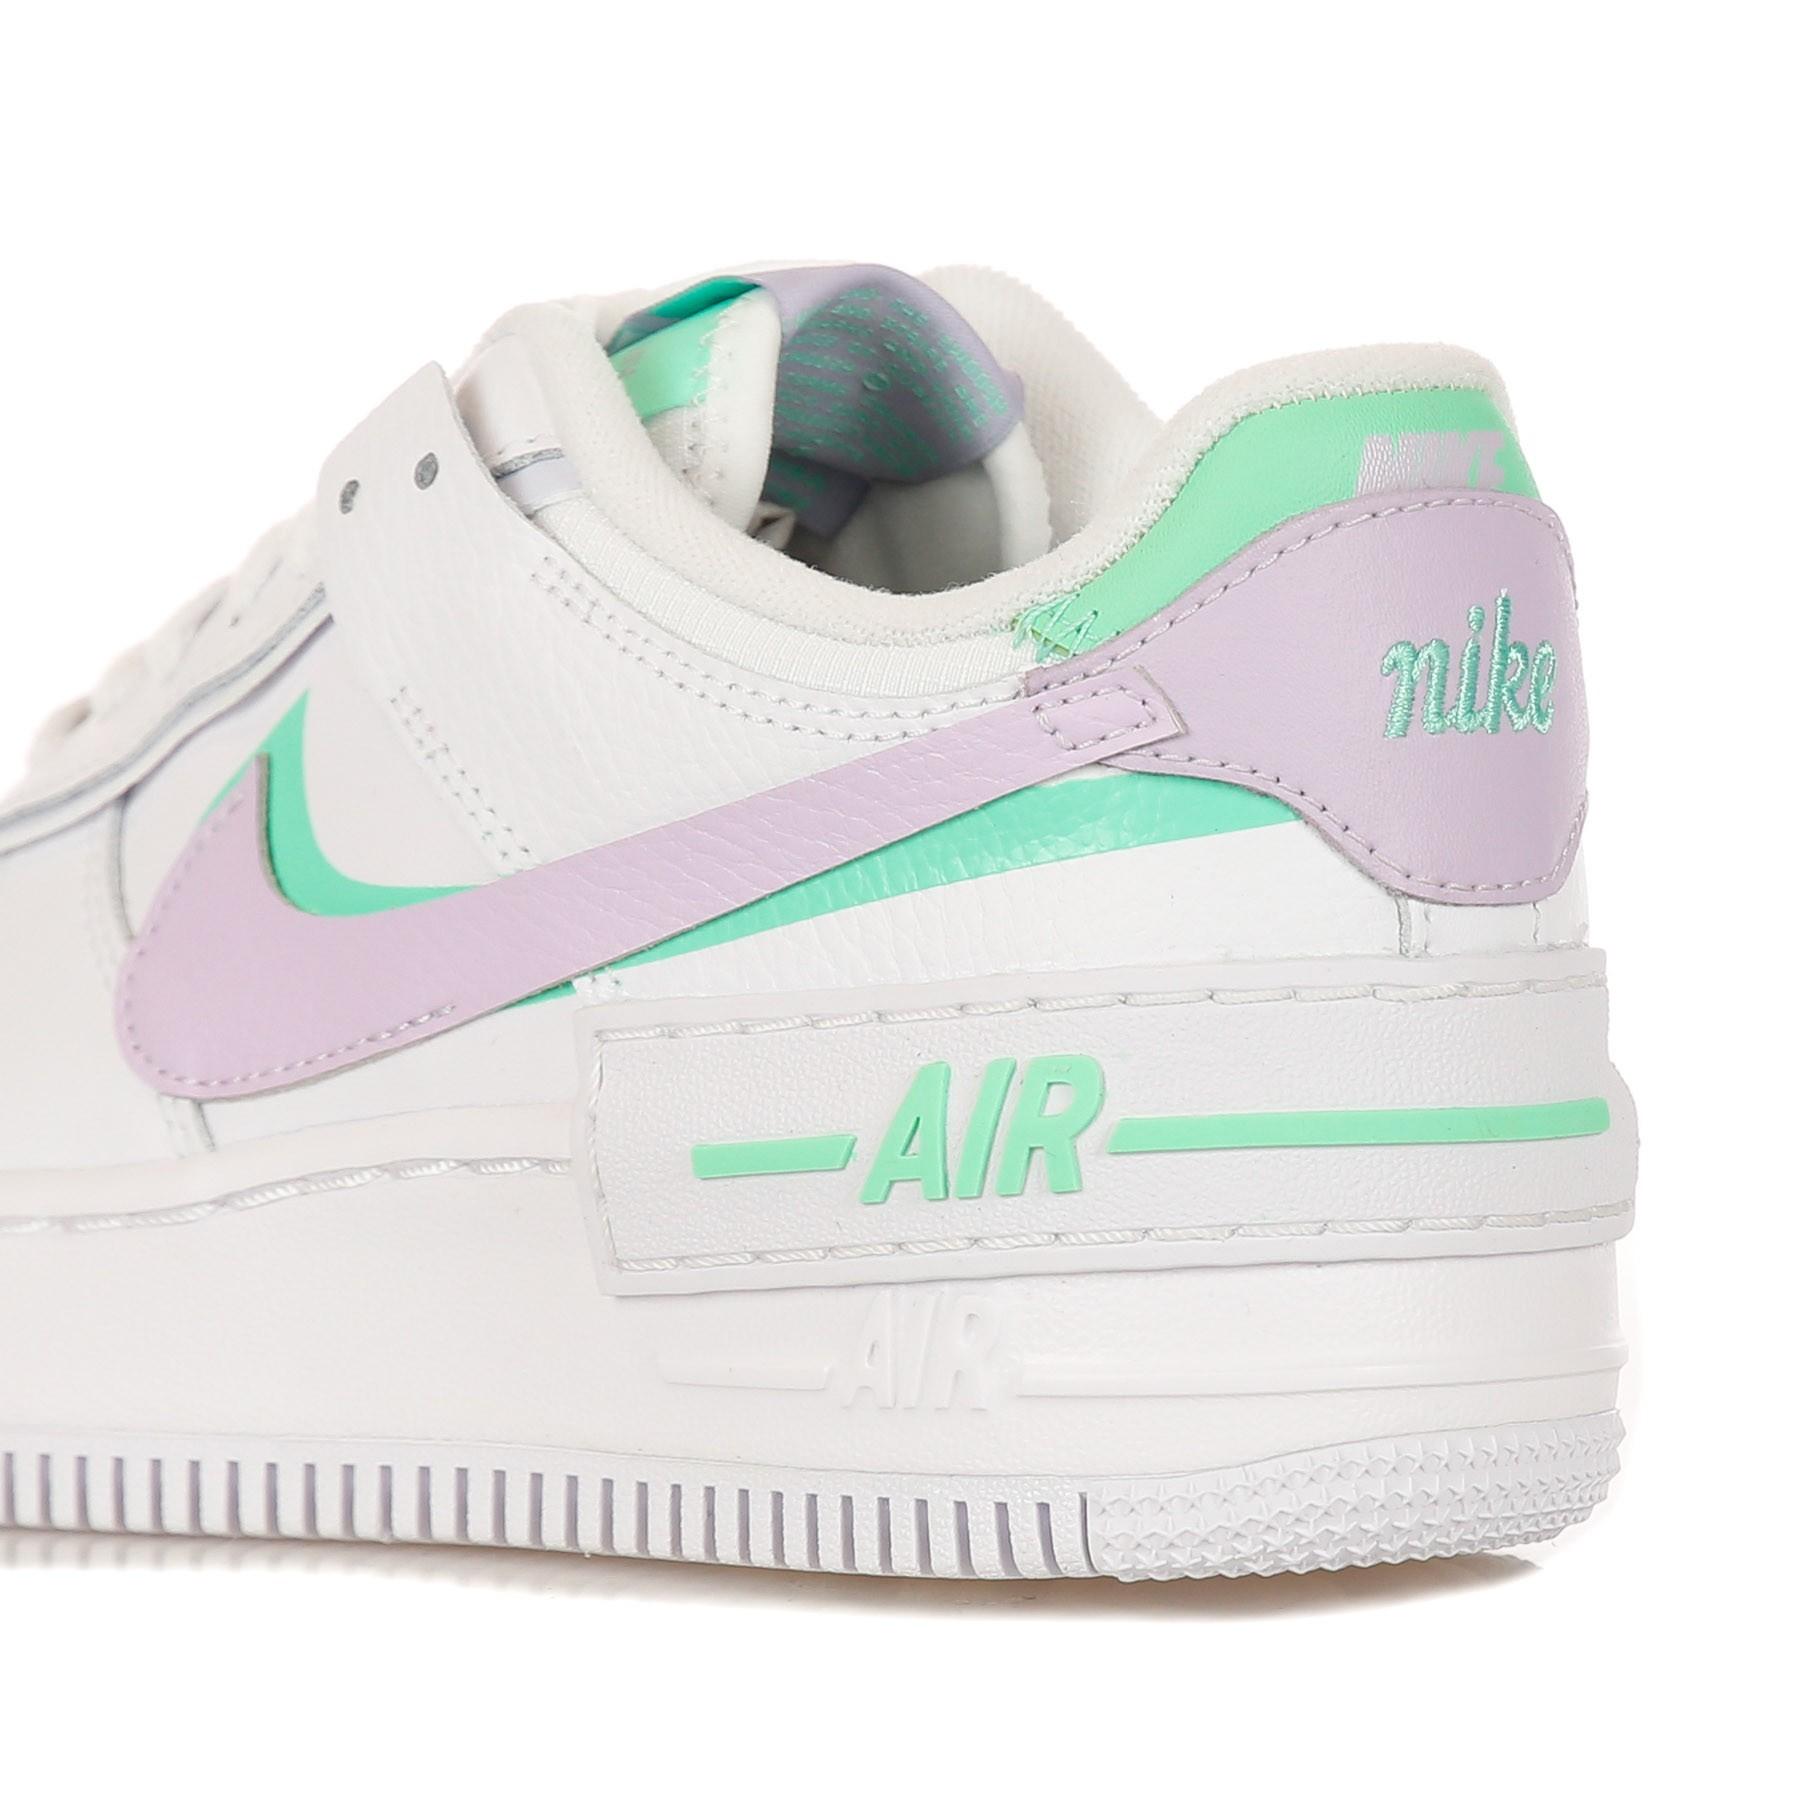 scarpa bassa donna air force 1 shadow WHITE/INFINITE LILAC/FOOTBALL GREY